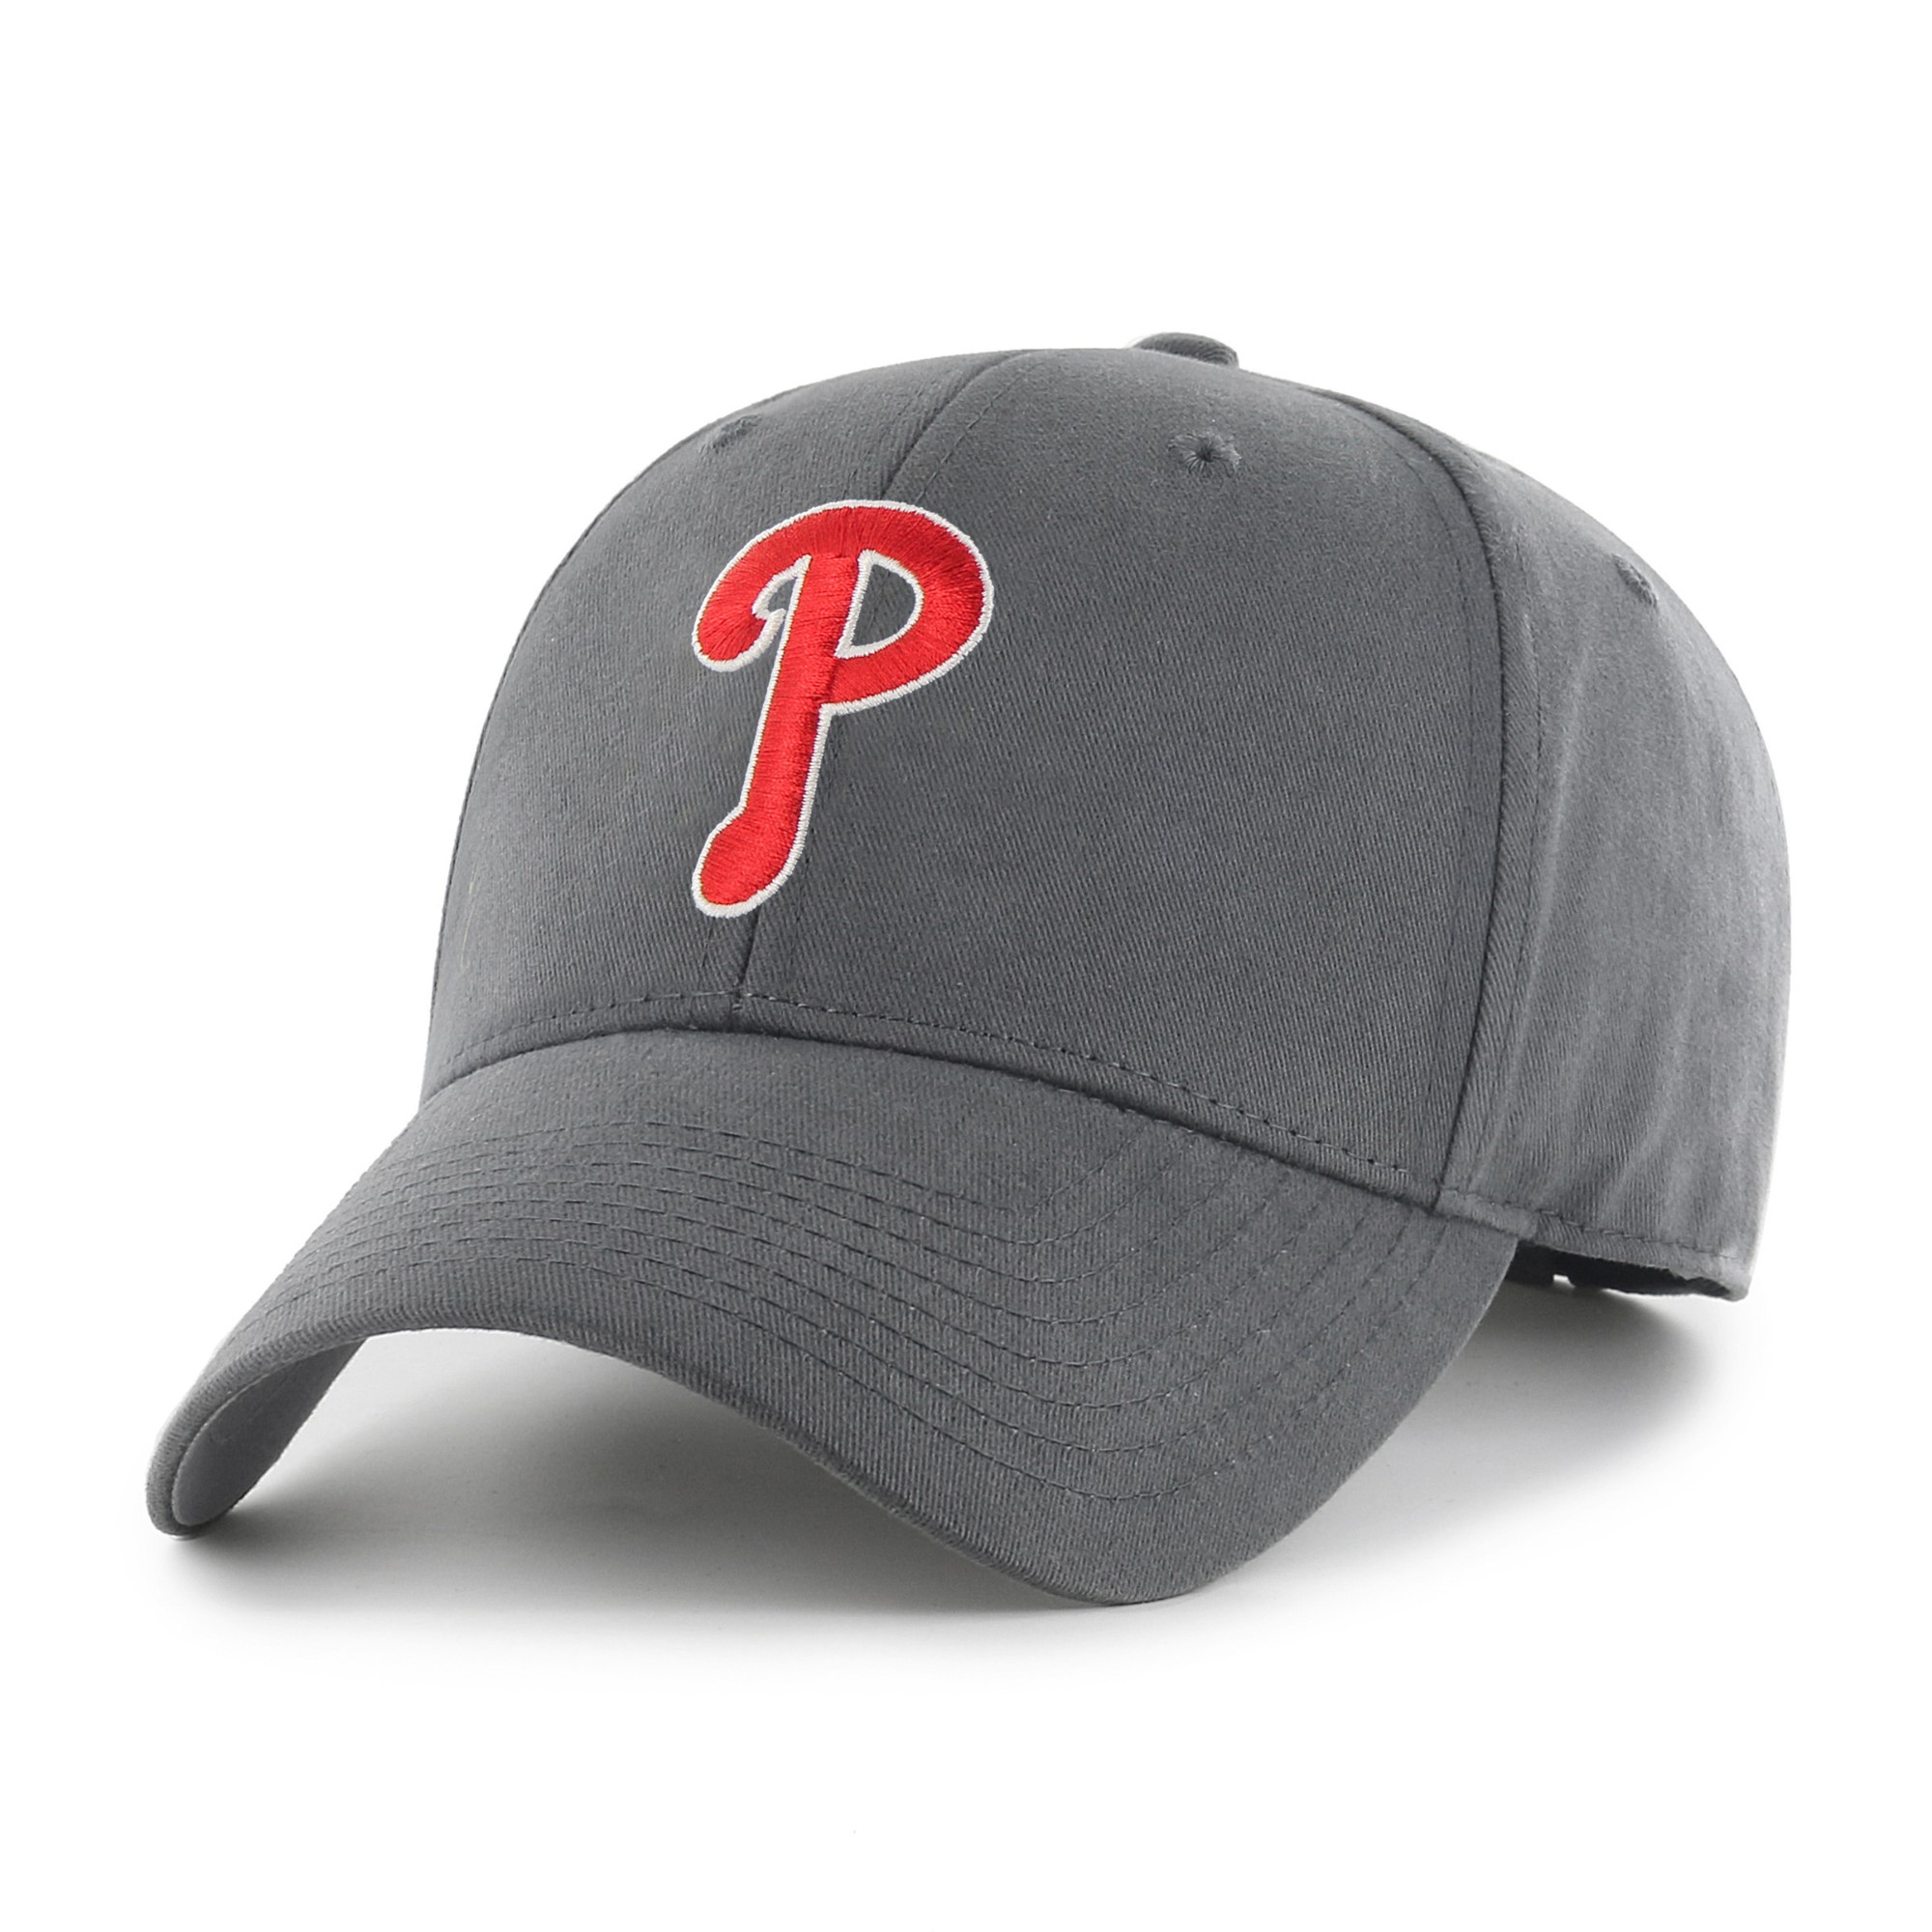 Fan Favorite MLB Basic Adjustable Hat, Philadelphia Phillies